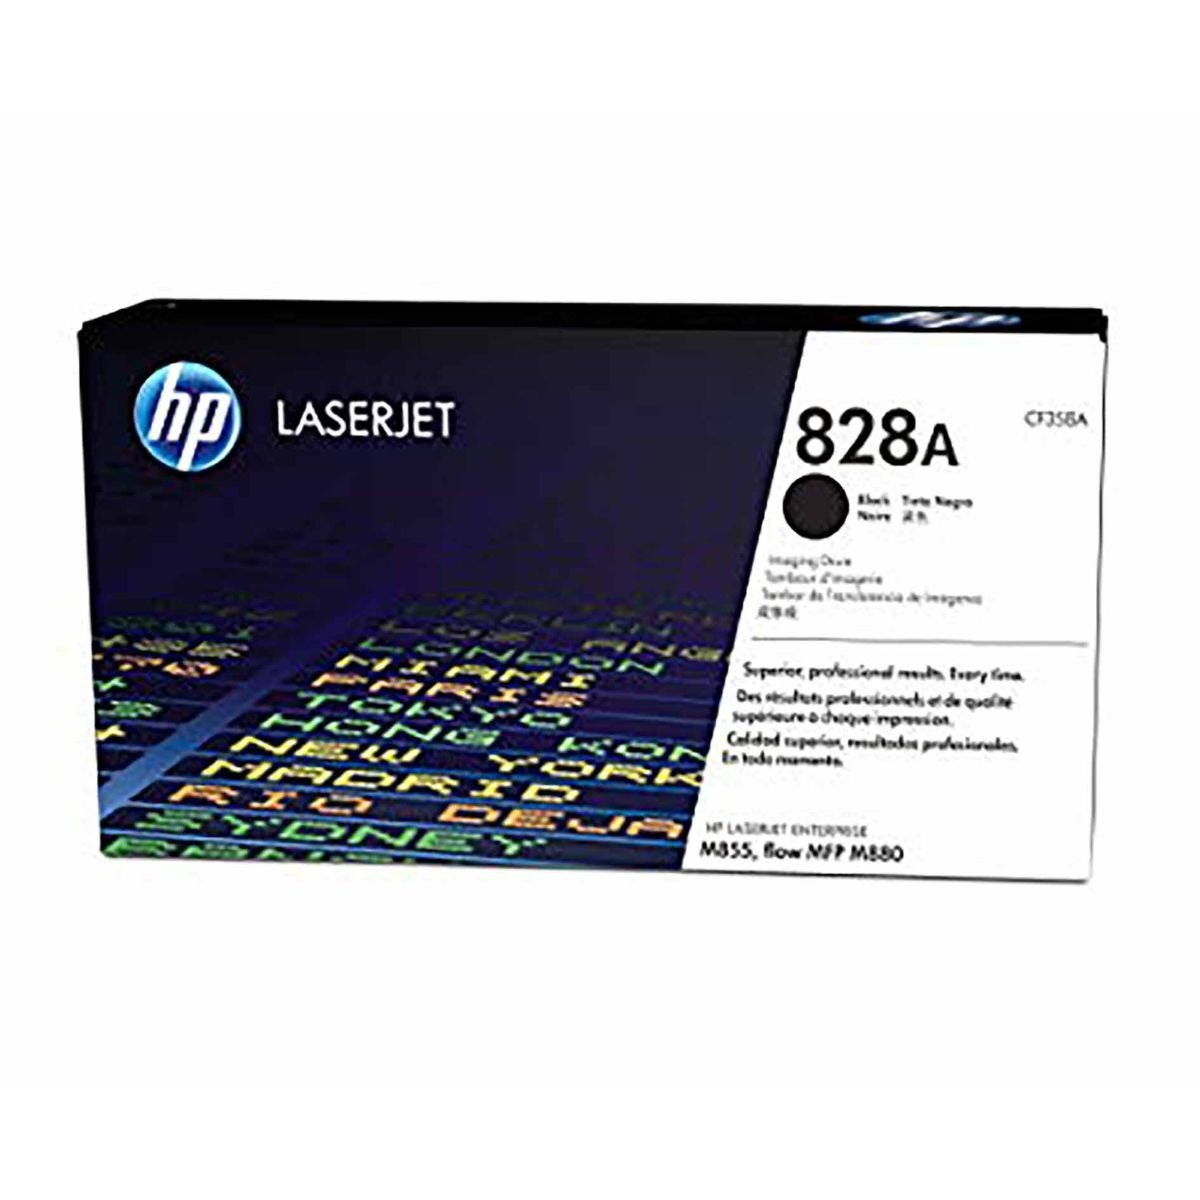 HP 828A Imaging Drum Black